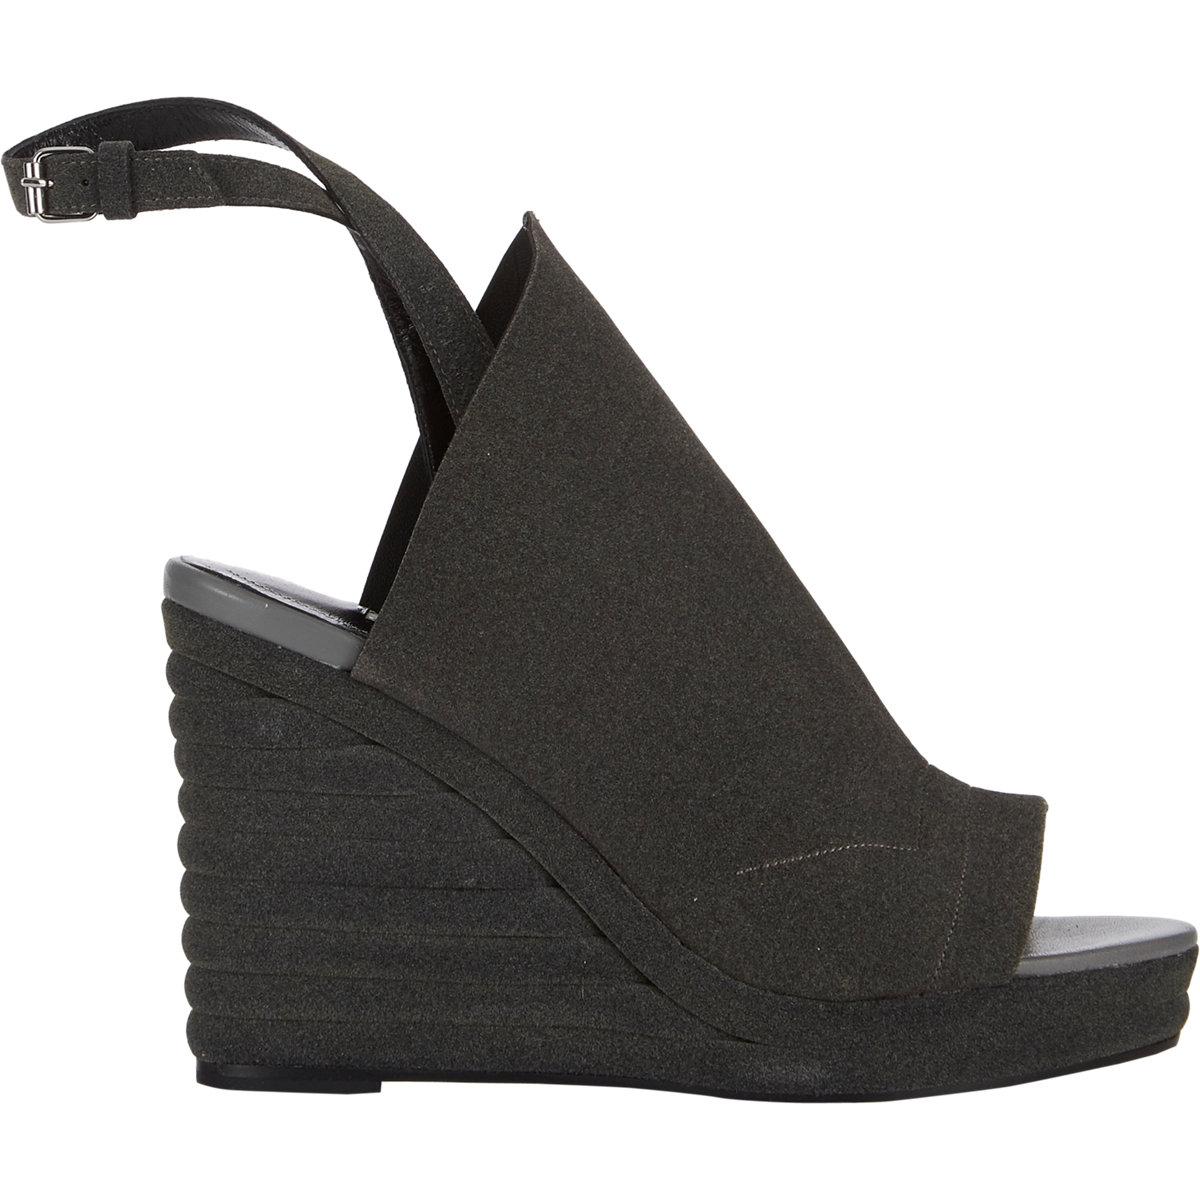 Balenciaga glove wedge sandals at barneys.com